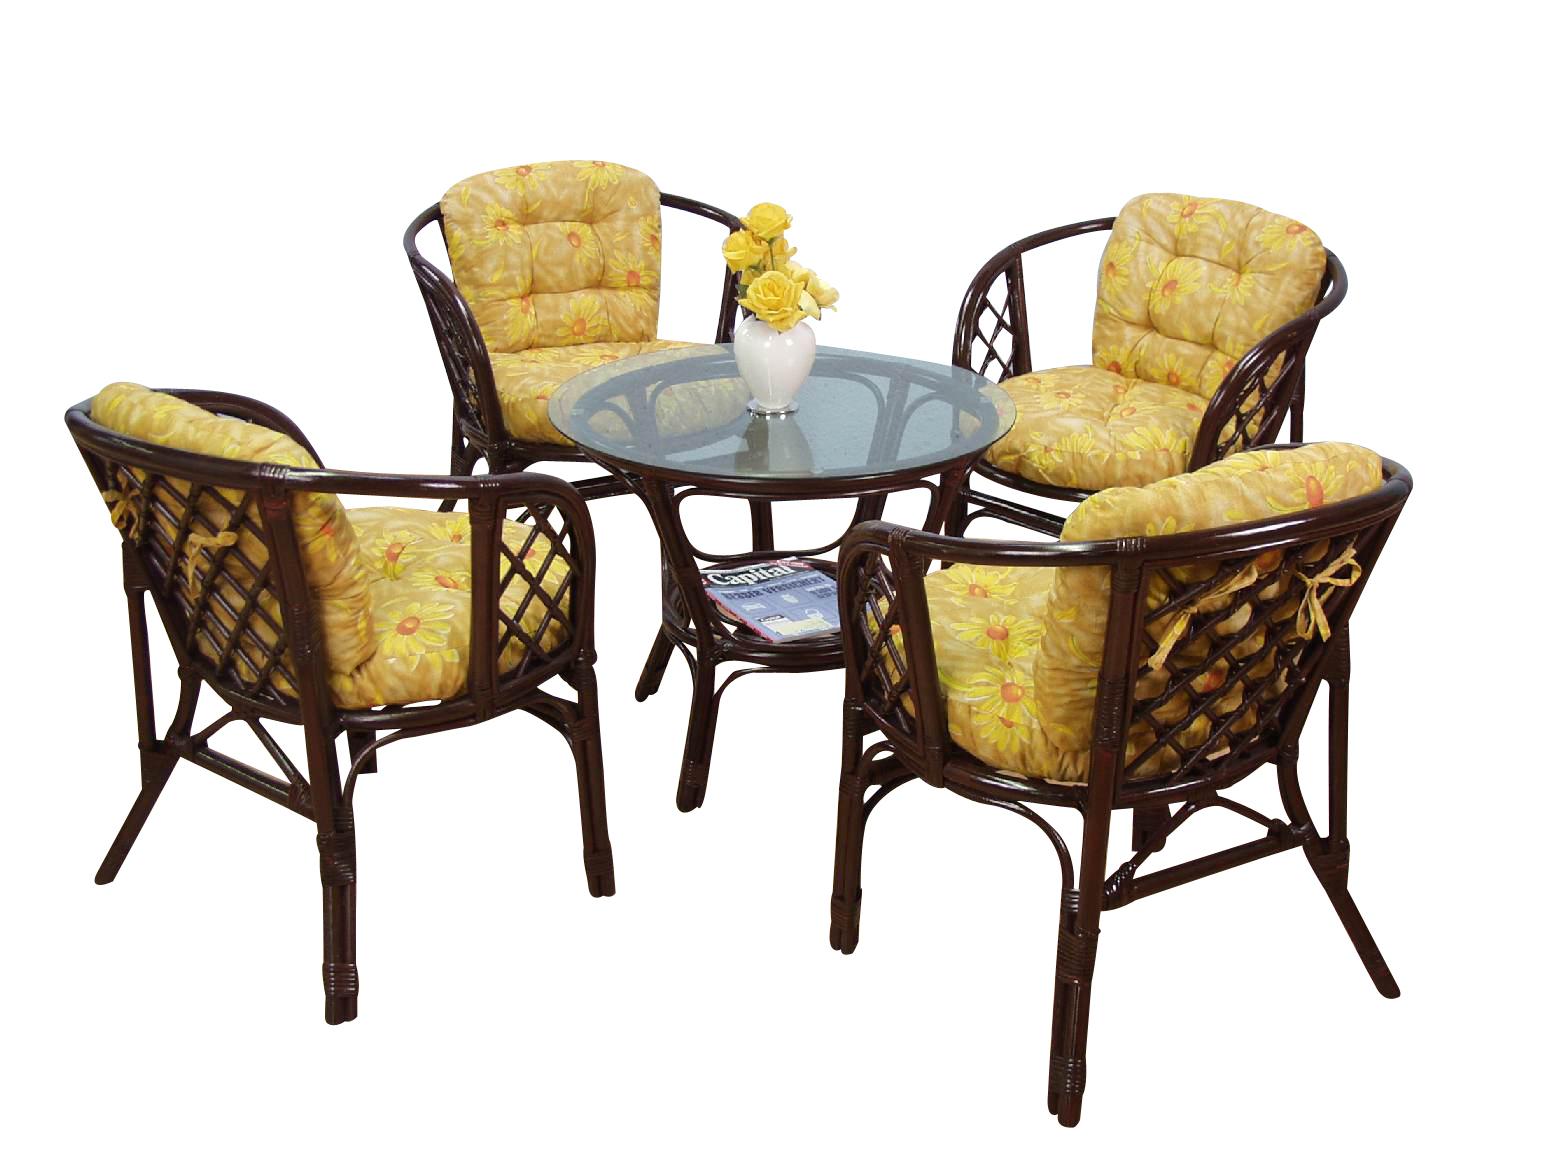 9091 rattangruppe 5teilig mit kissen hofmann rattanstuhl tisch in 3 farben ebay. Black Bedroom Furniture Sets. Home Design Ideas